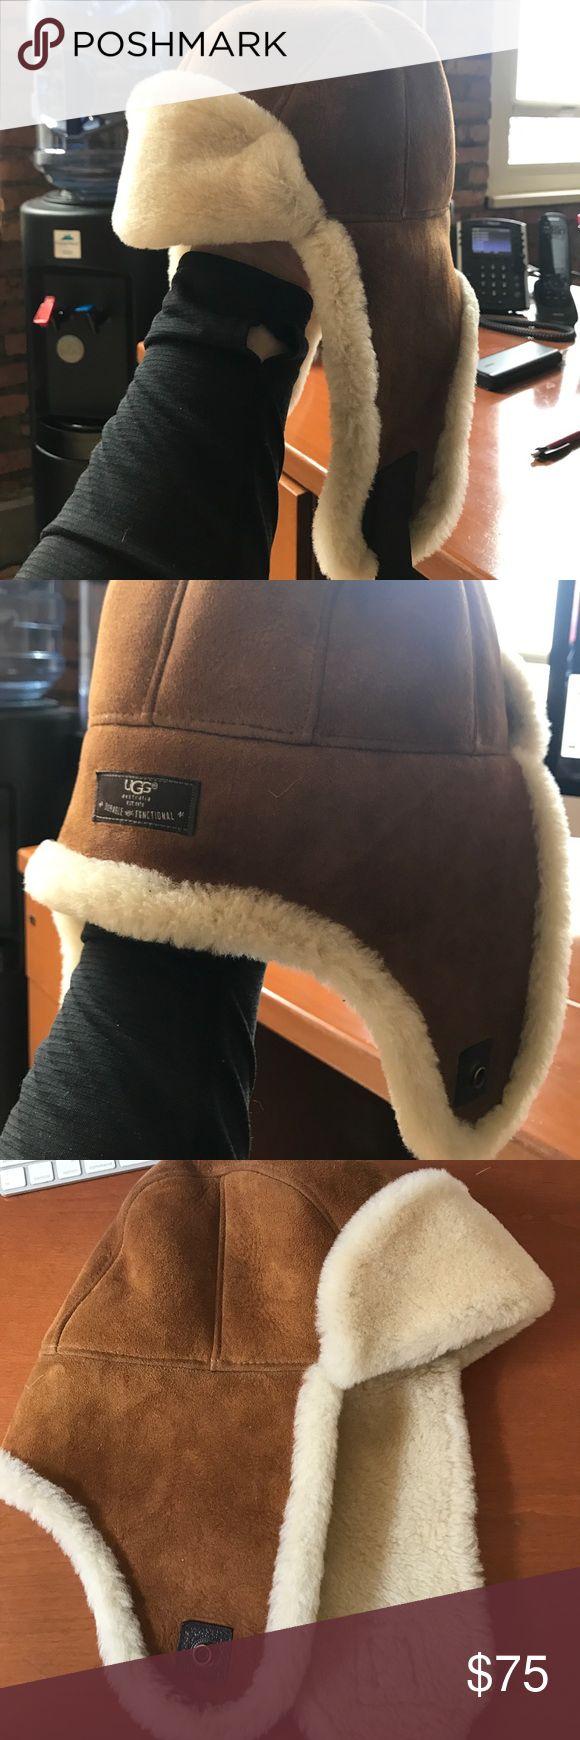 Ugg Australia Sheepskin Trapper Hat - L/XL Slightly used men's ugg Australia sheepskin trapper hat - chestnut - l/xl UGG Other